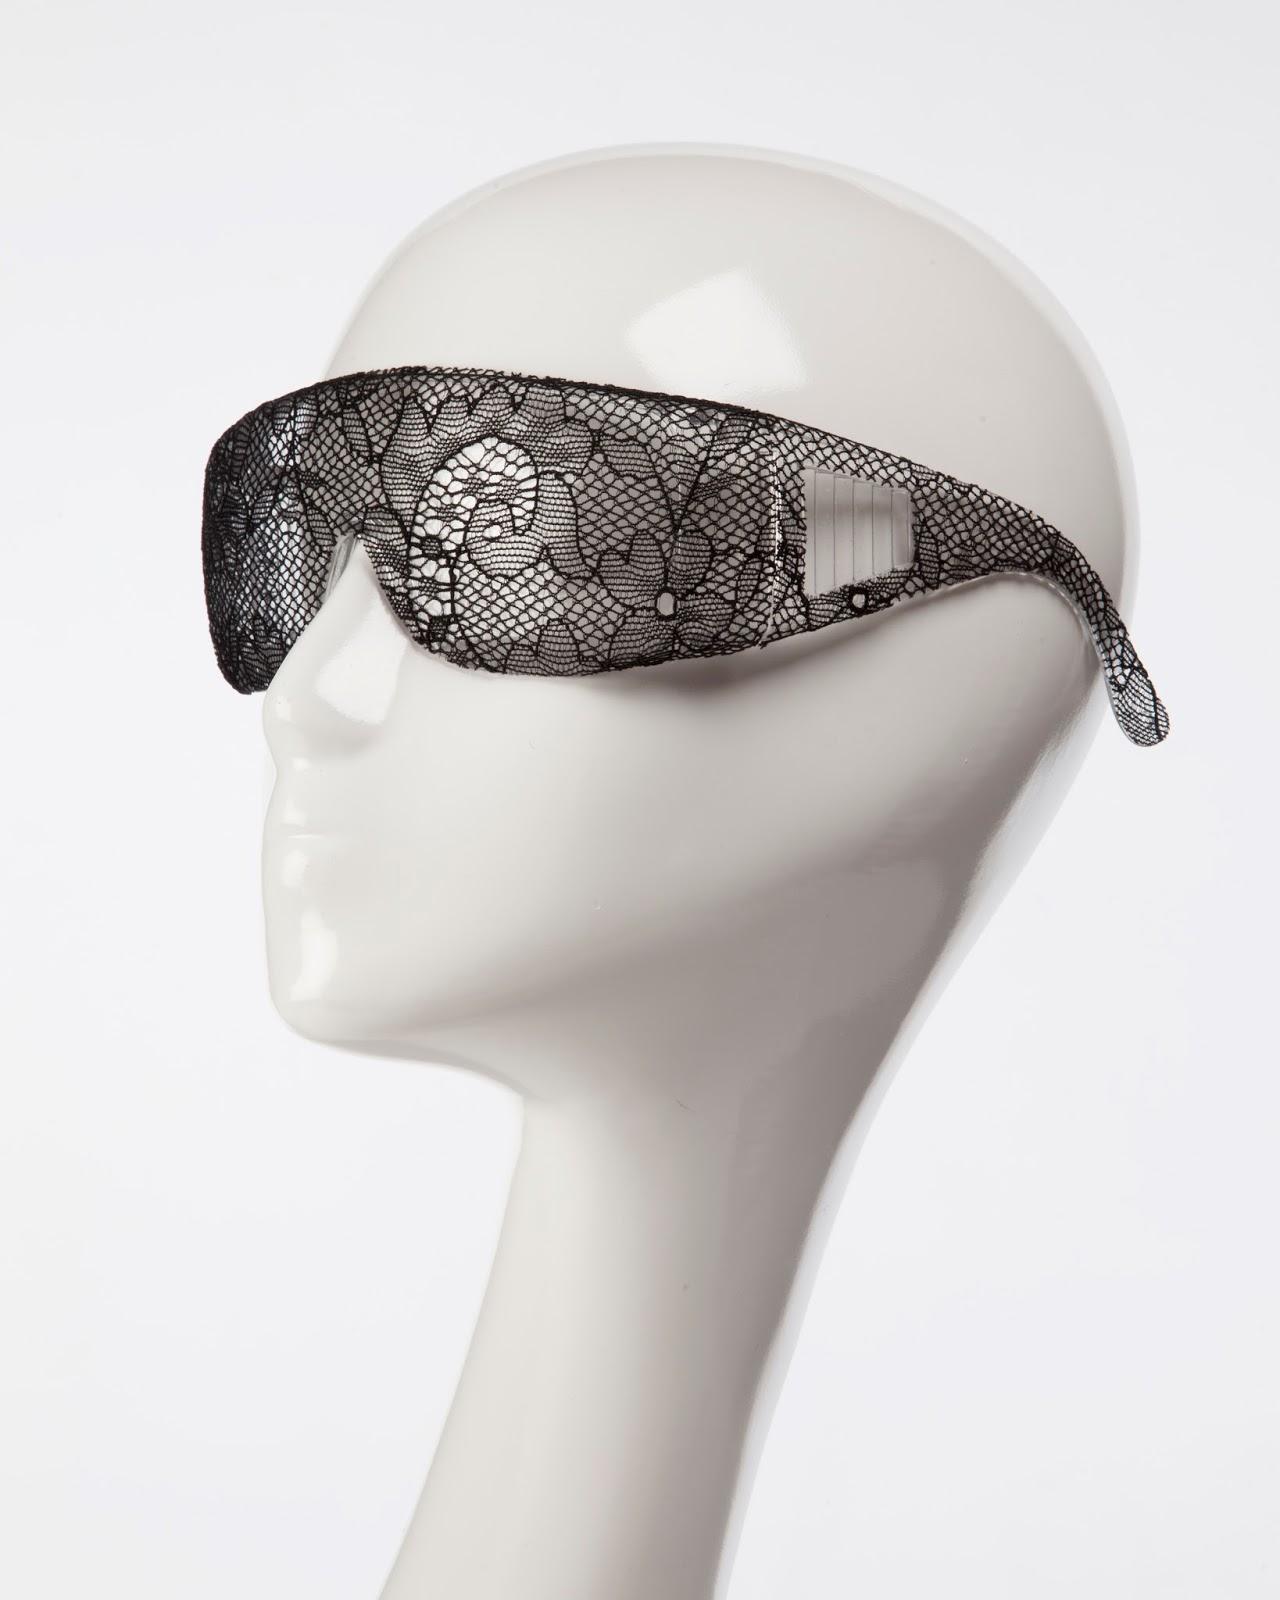 Mystic Magic, celebrity shades, designer glasses, Fashion shades, Fashion, lace glasses, photo, couture shades, costume glasses, fancy dress, fetish, cat mask, gothic,